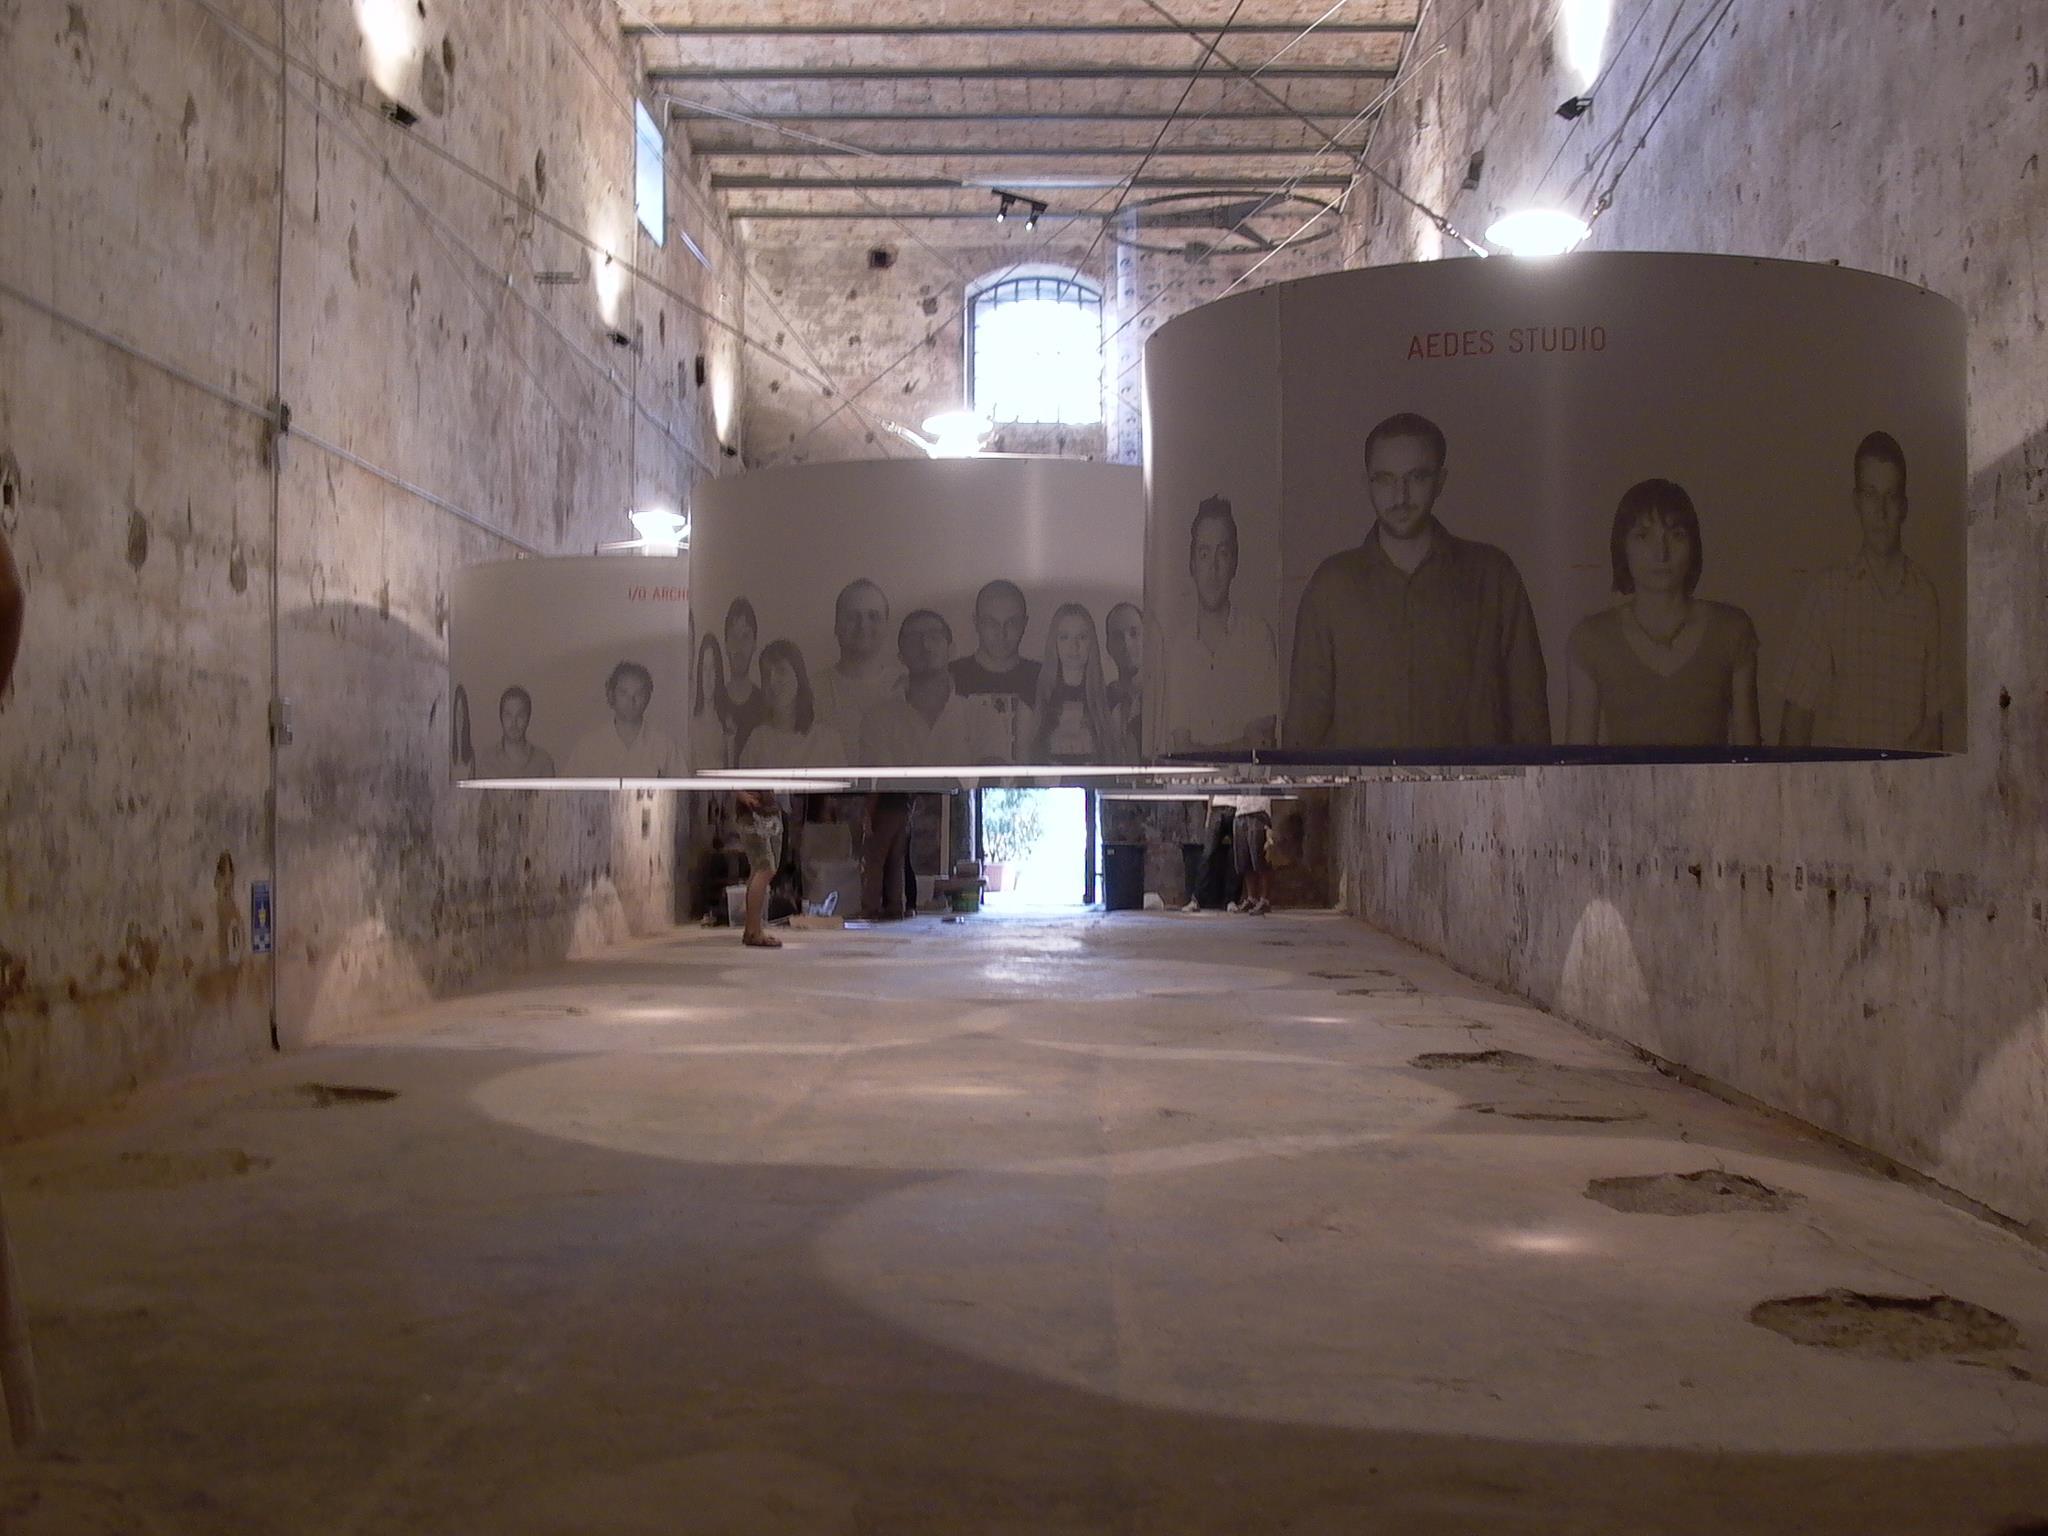 k_Biennale di Venezia.jpg